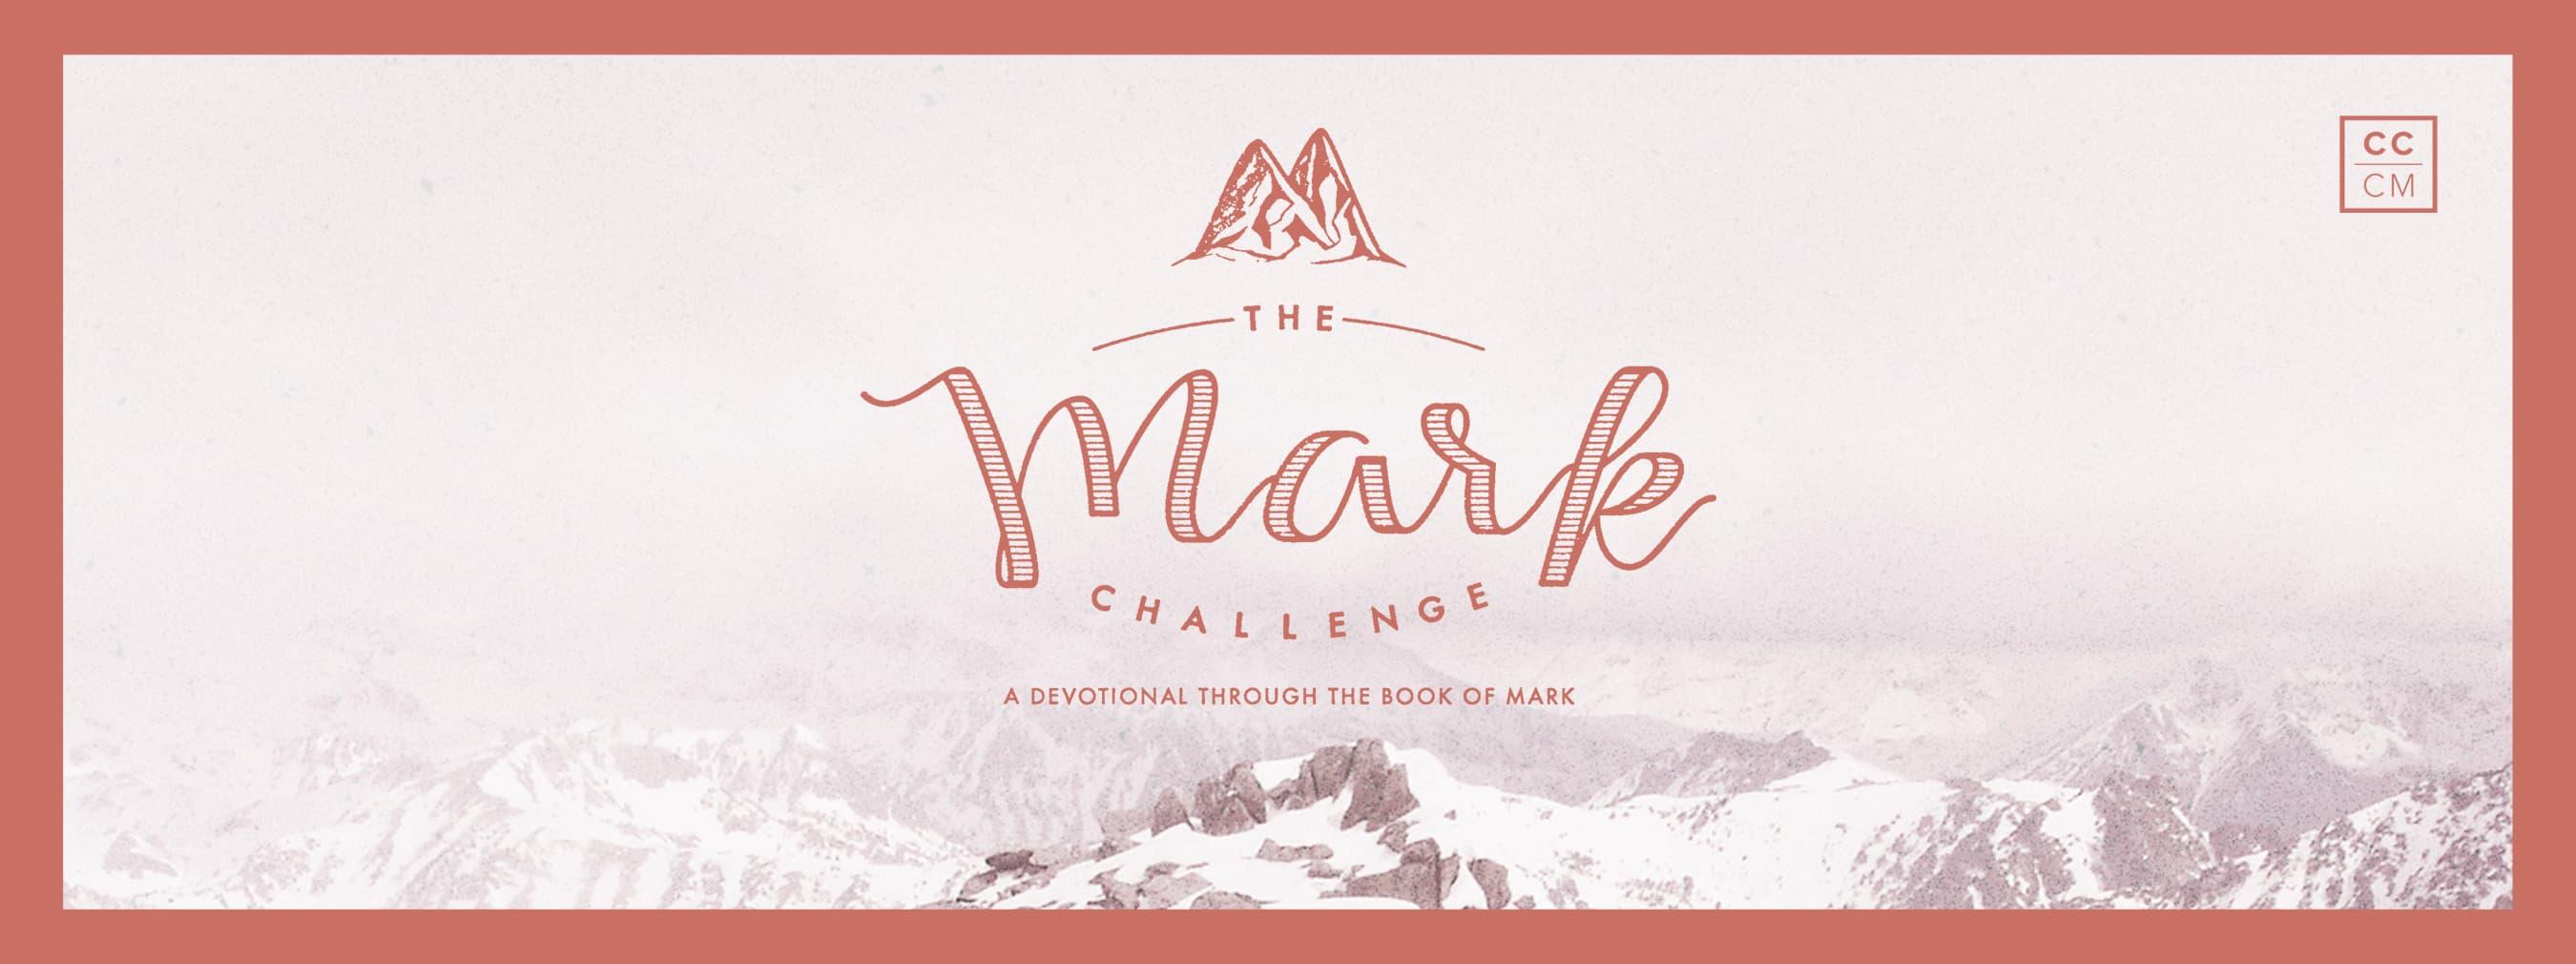 Mark Challenge_2700x1010 (1)